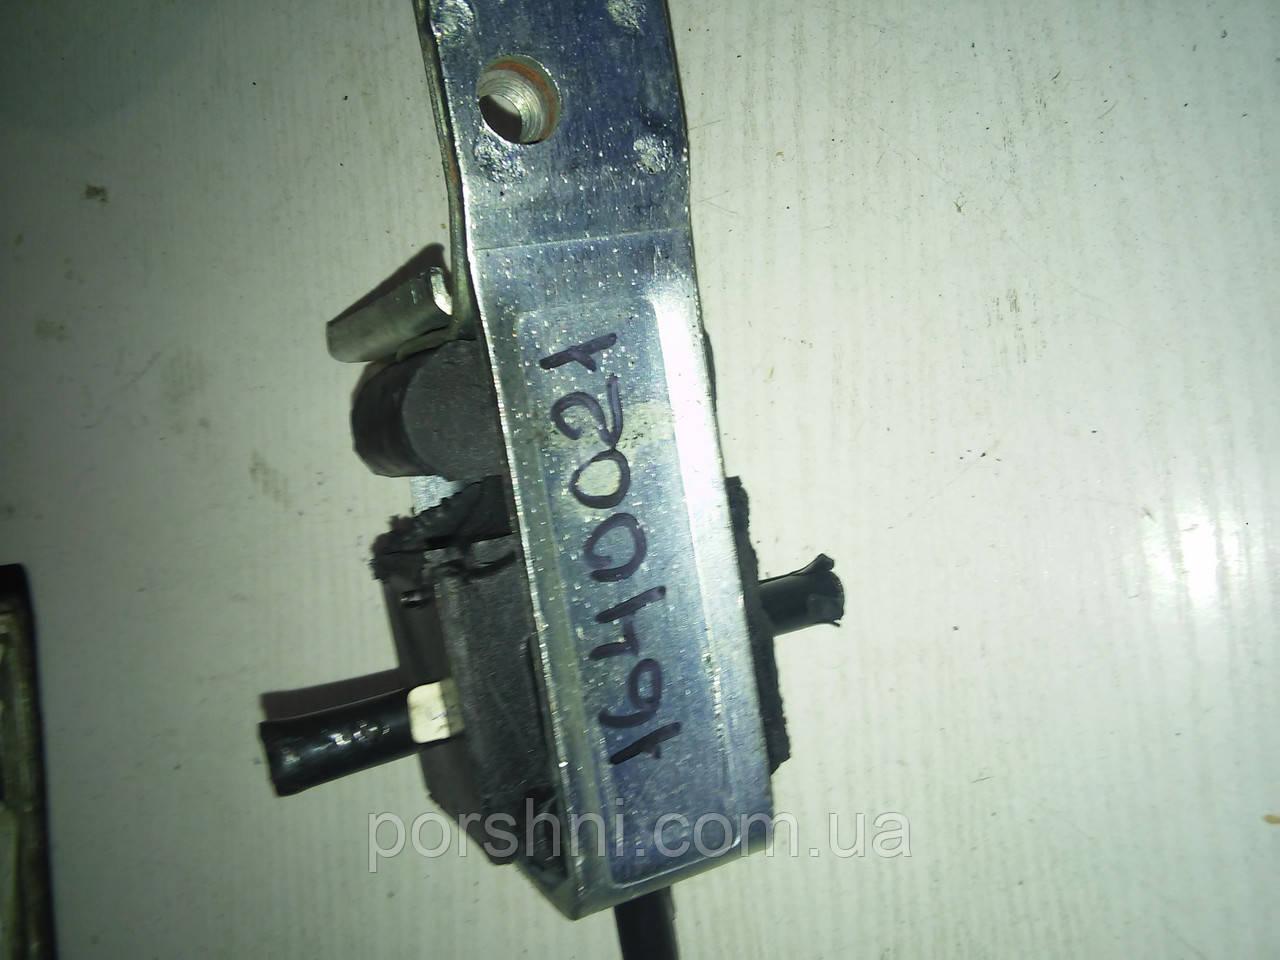 Подушка двигуна Ford Escort 86 -- Fiesta 84 -- CVH RH 1640021